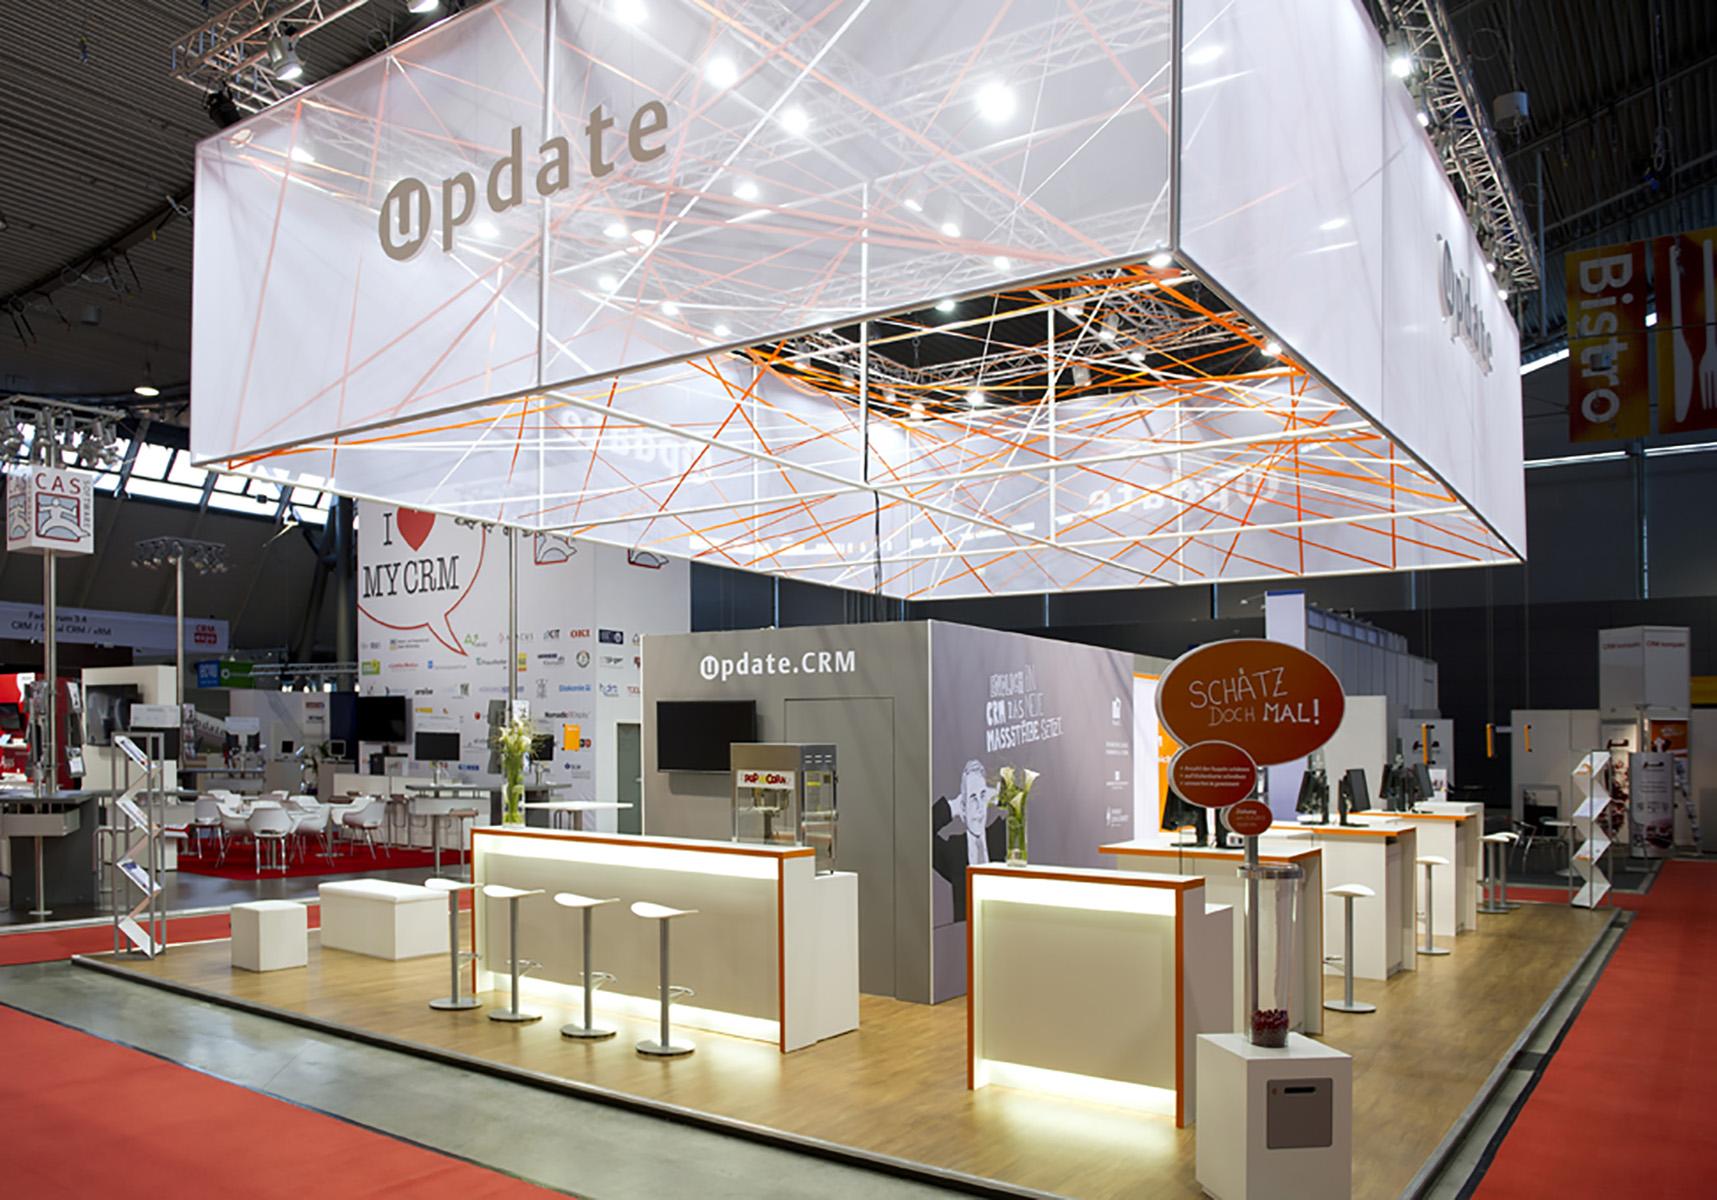 Update CRM Expo Stuttgart Messestand von Blickfang Messebau